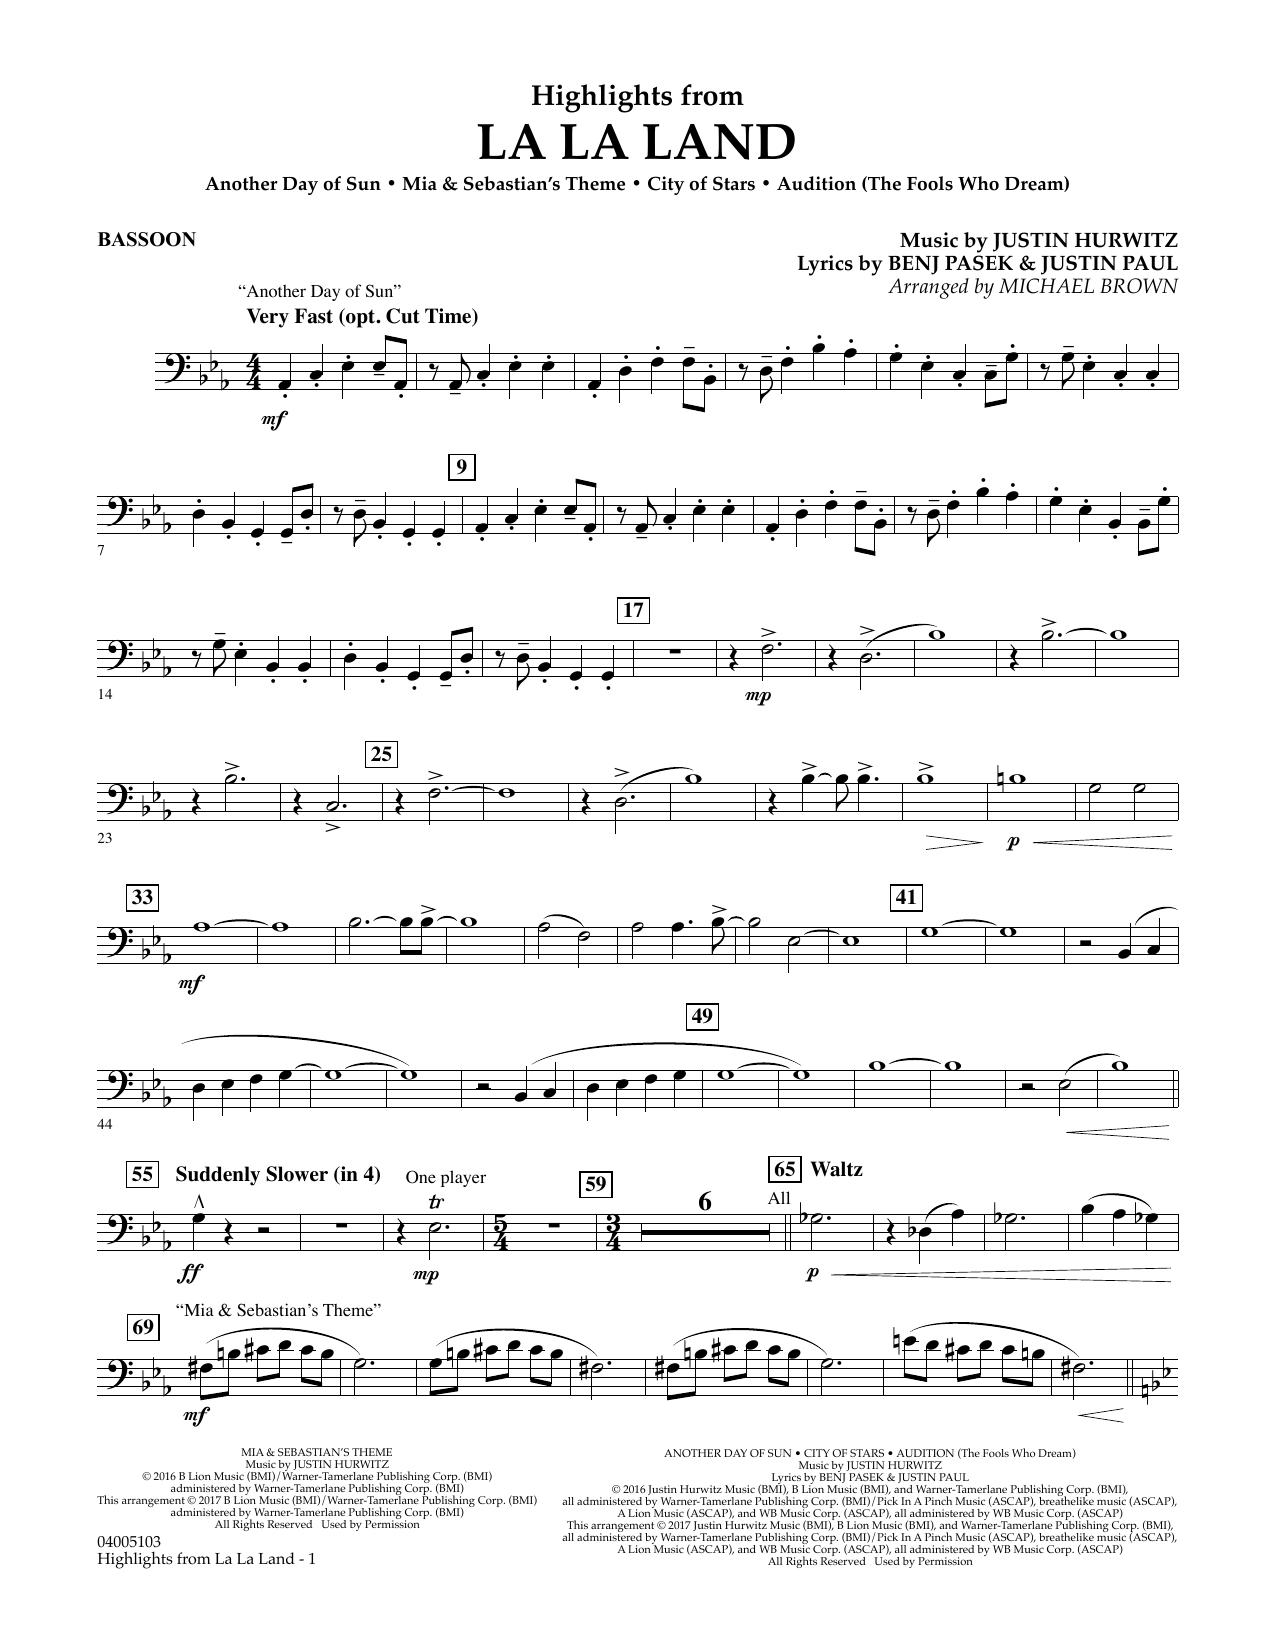 Highlights from La La Land - Bassoon (Concert Band)